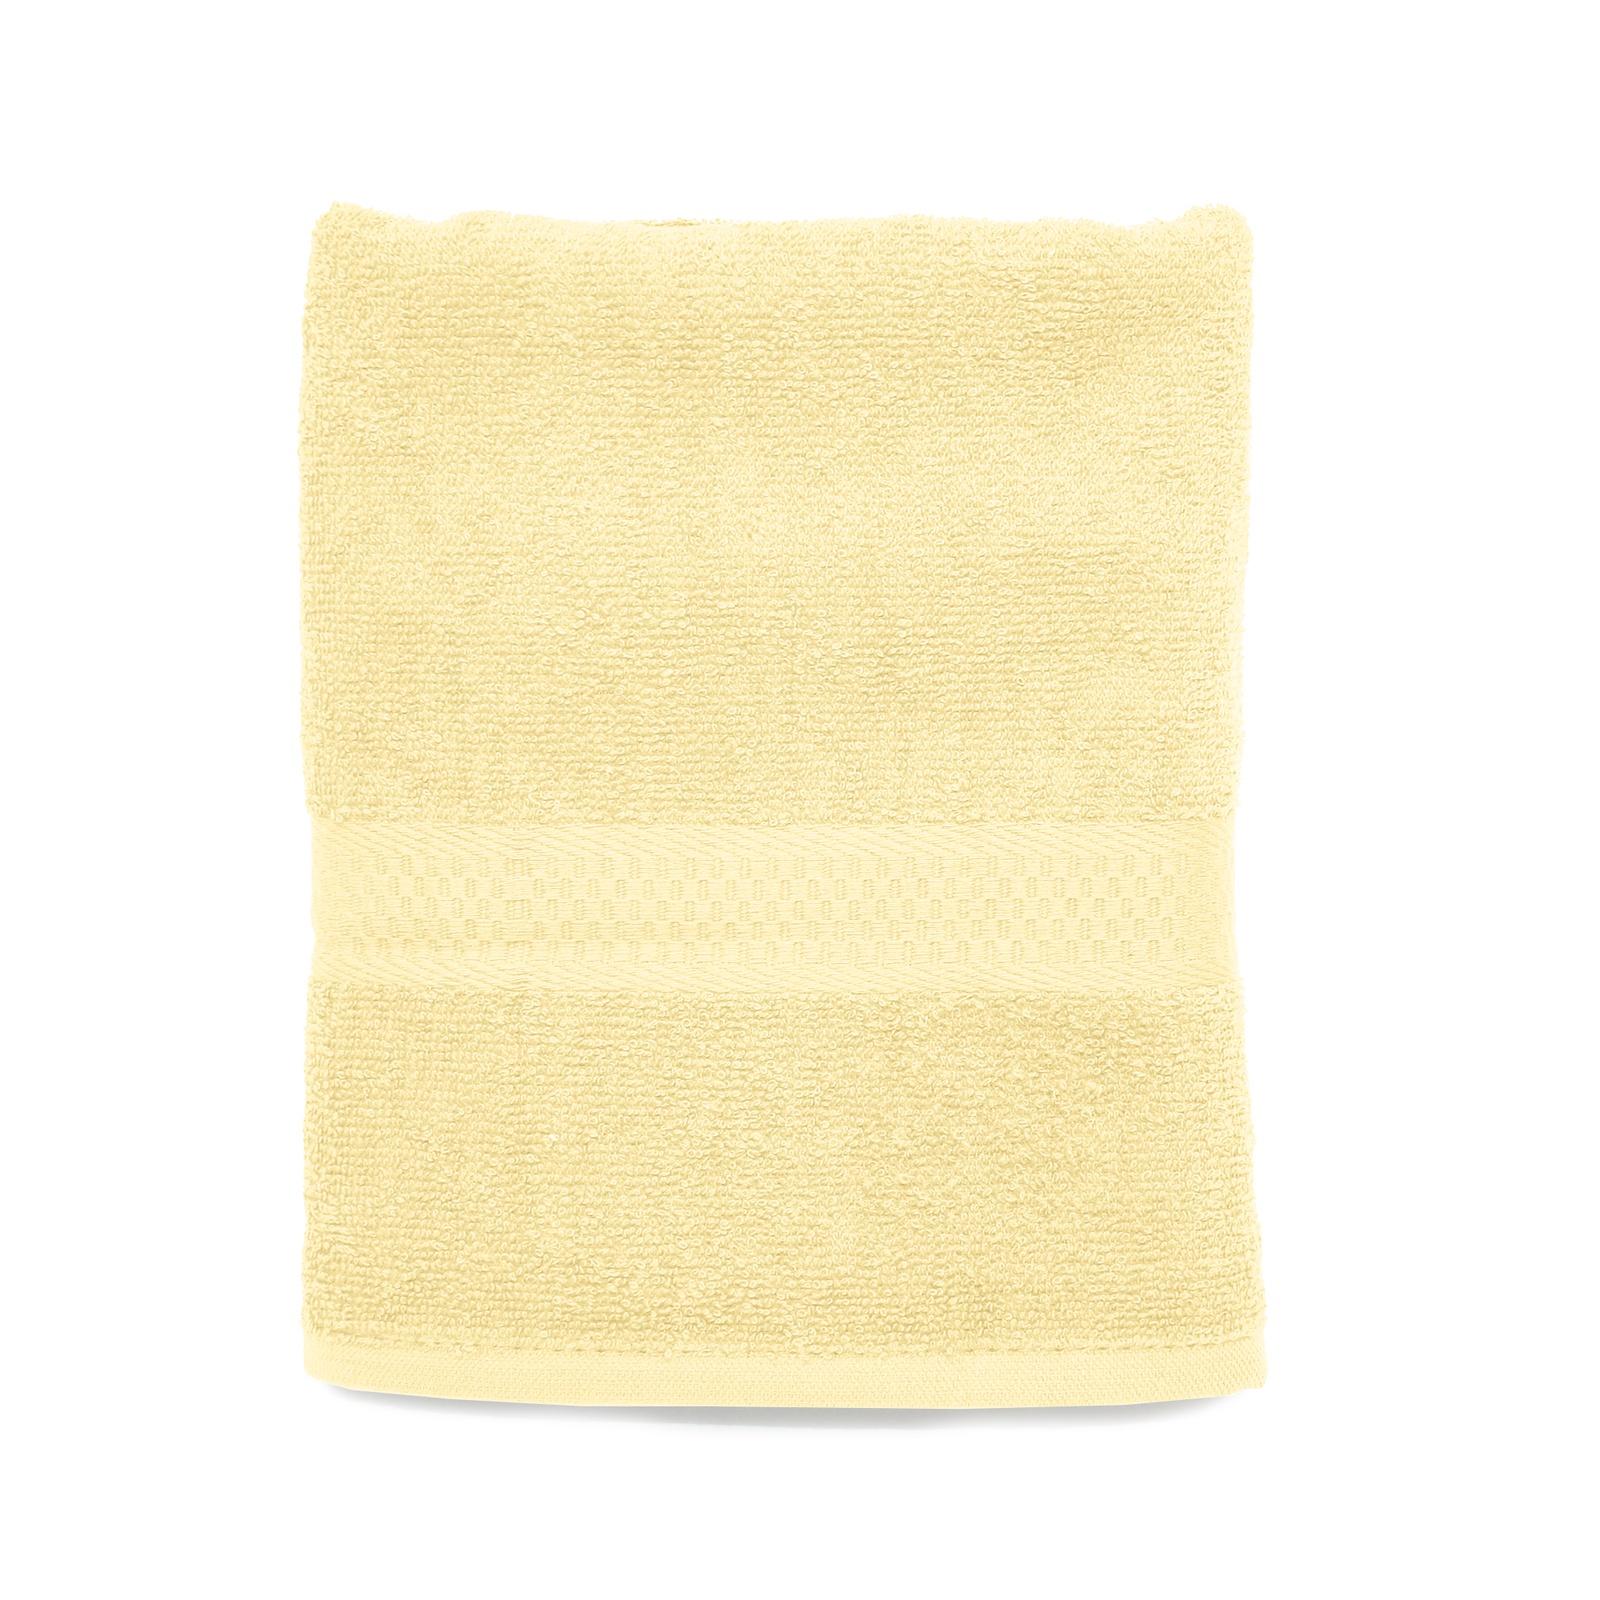 Полотенце банное Spany, 21311318175, махровое, бежевый, 50 х 90 см полотенце банное fiesta arabesca 50 90 см